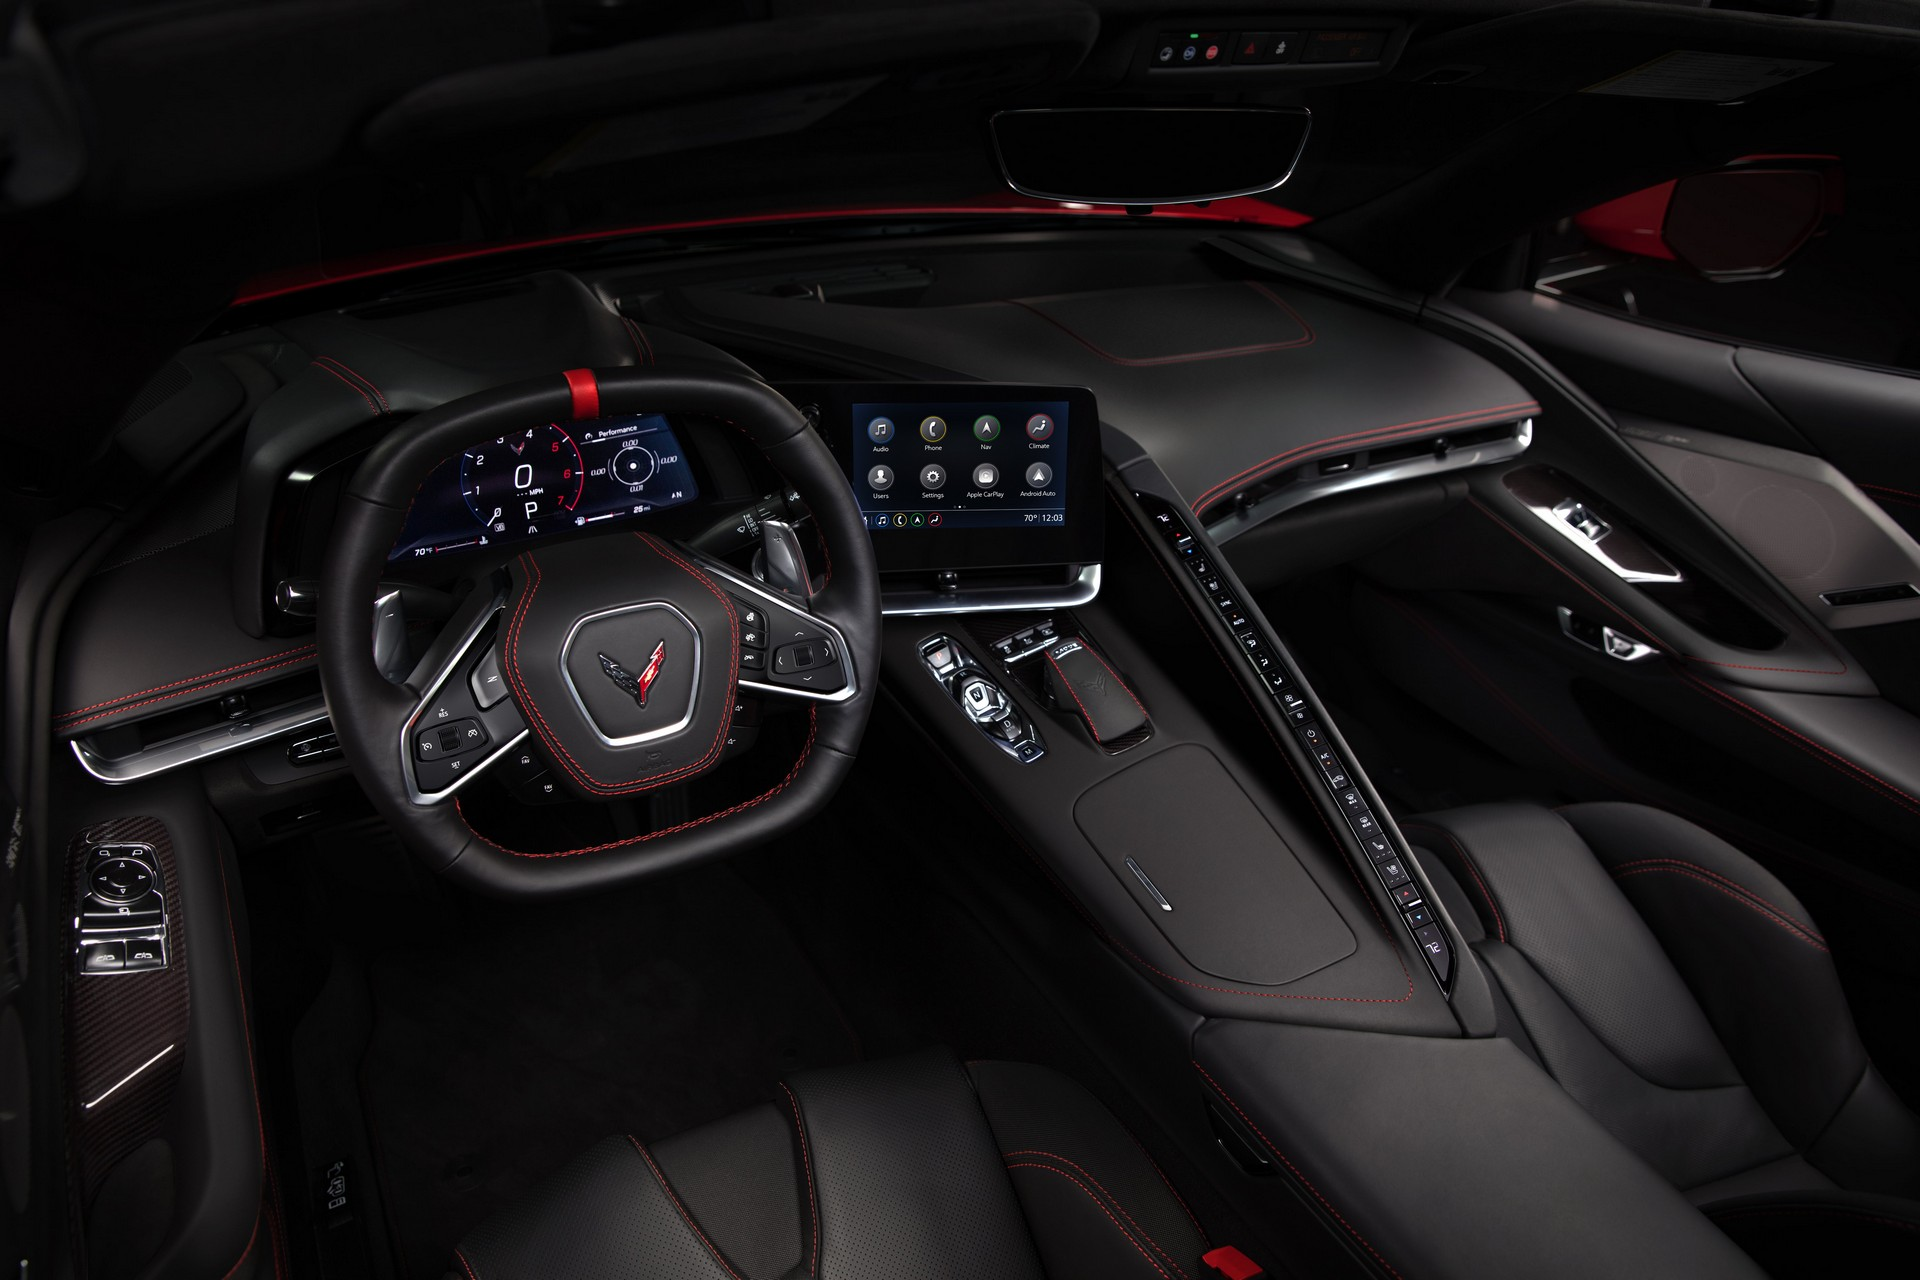 Живые фото и все подробности революционного Chevrolet Corvette 2020